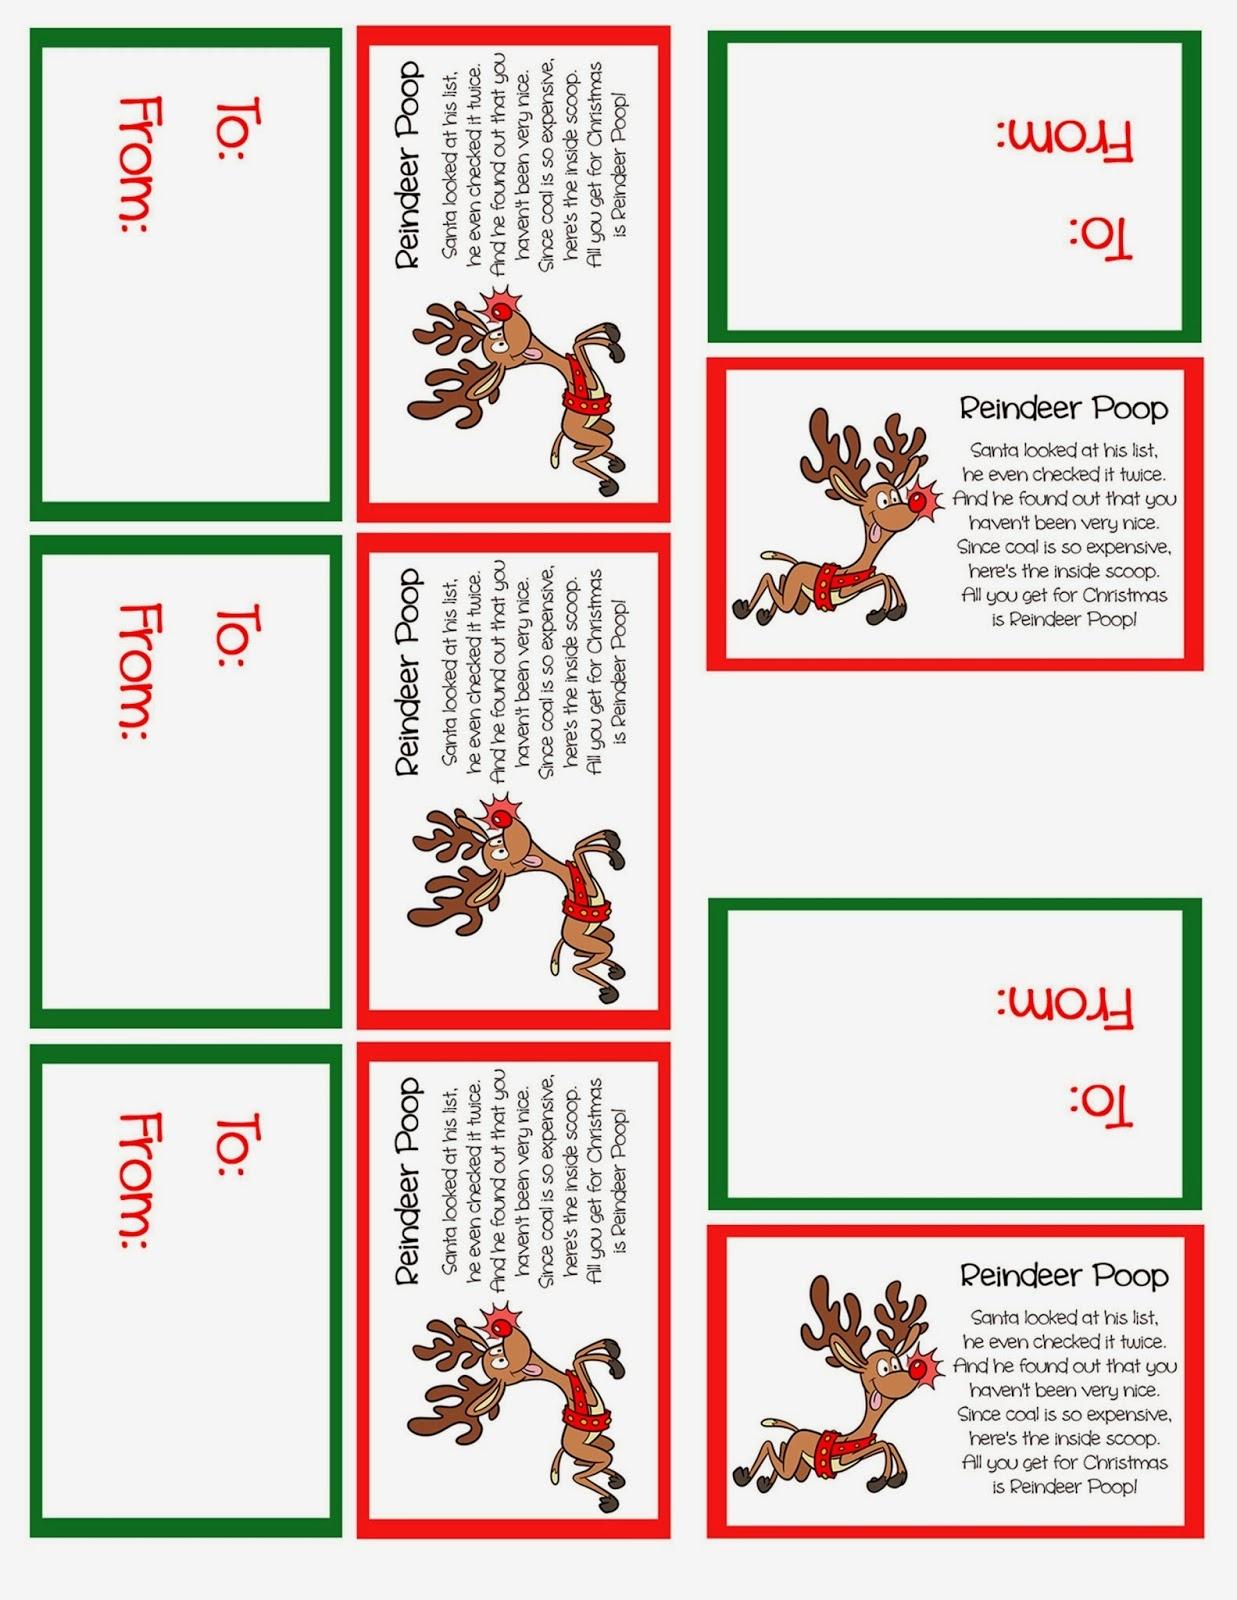 Reindeer Poop Stocking Stuffer Or Party Favor – Free Printable - Grinch Pills Free Printable